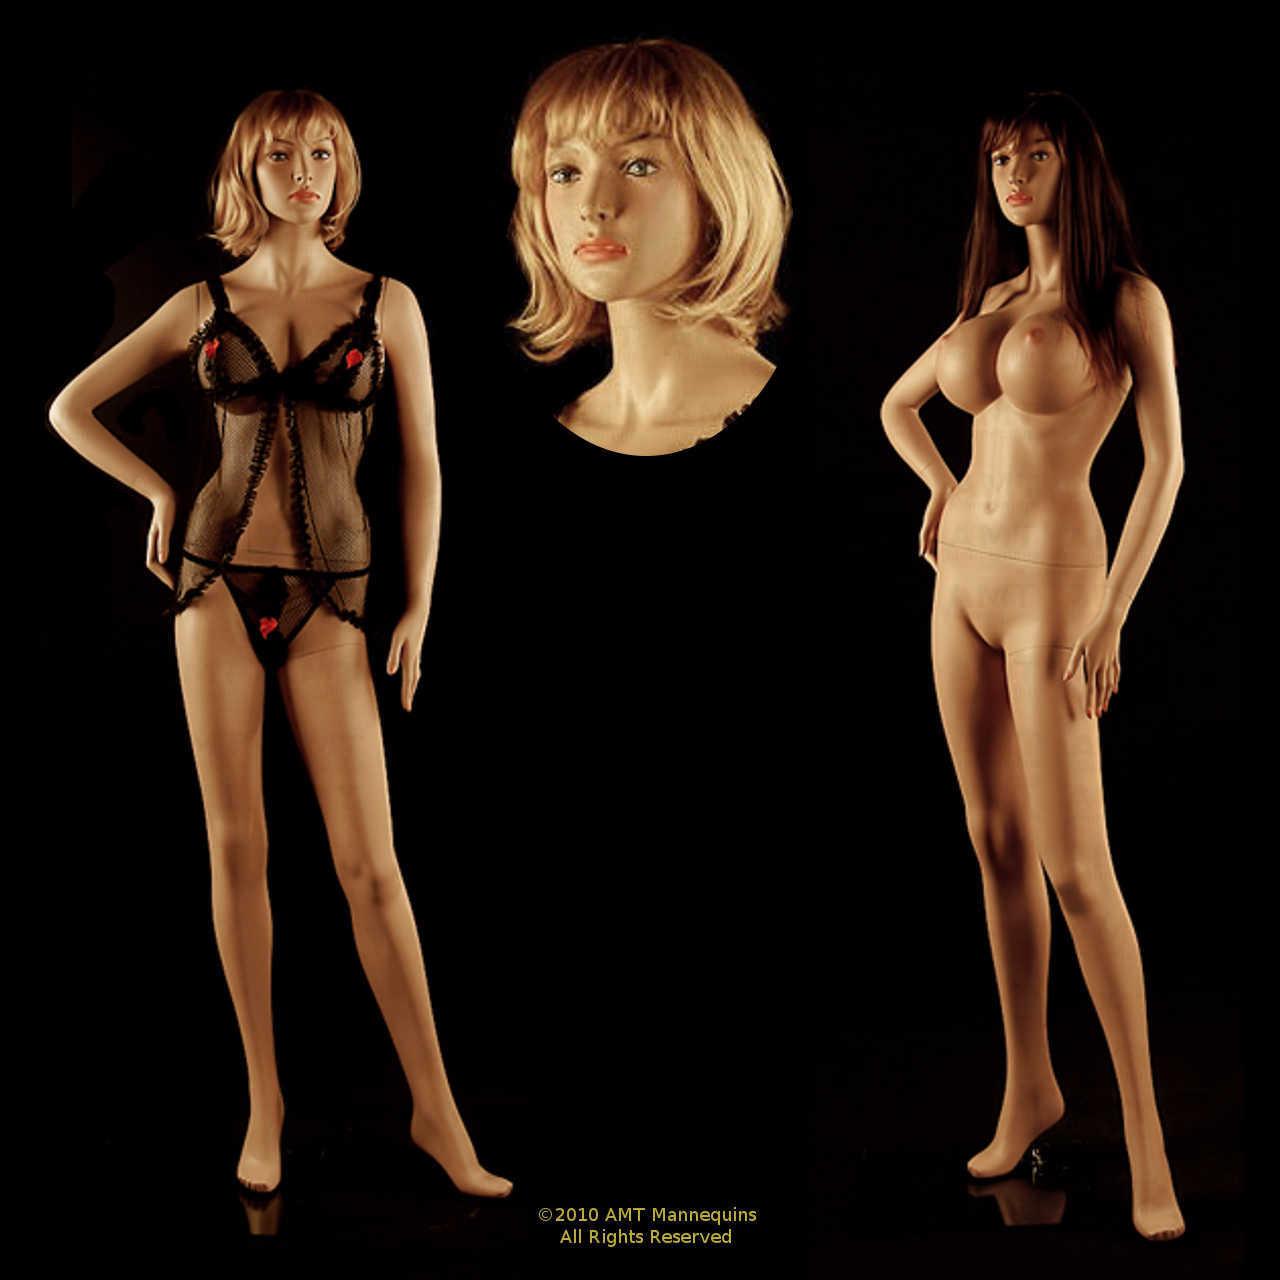 Sexy female mannequin